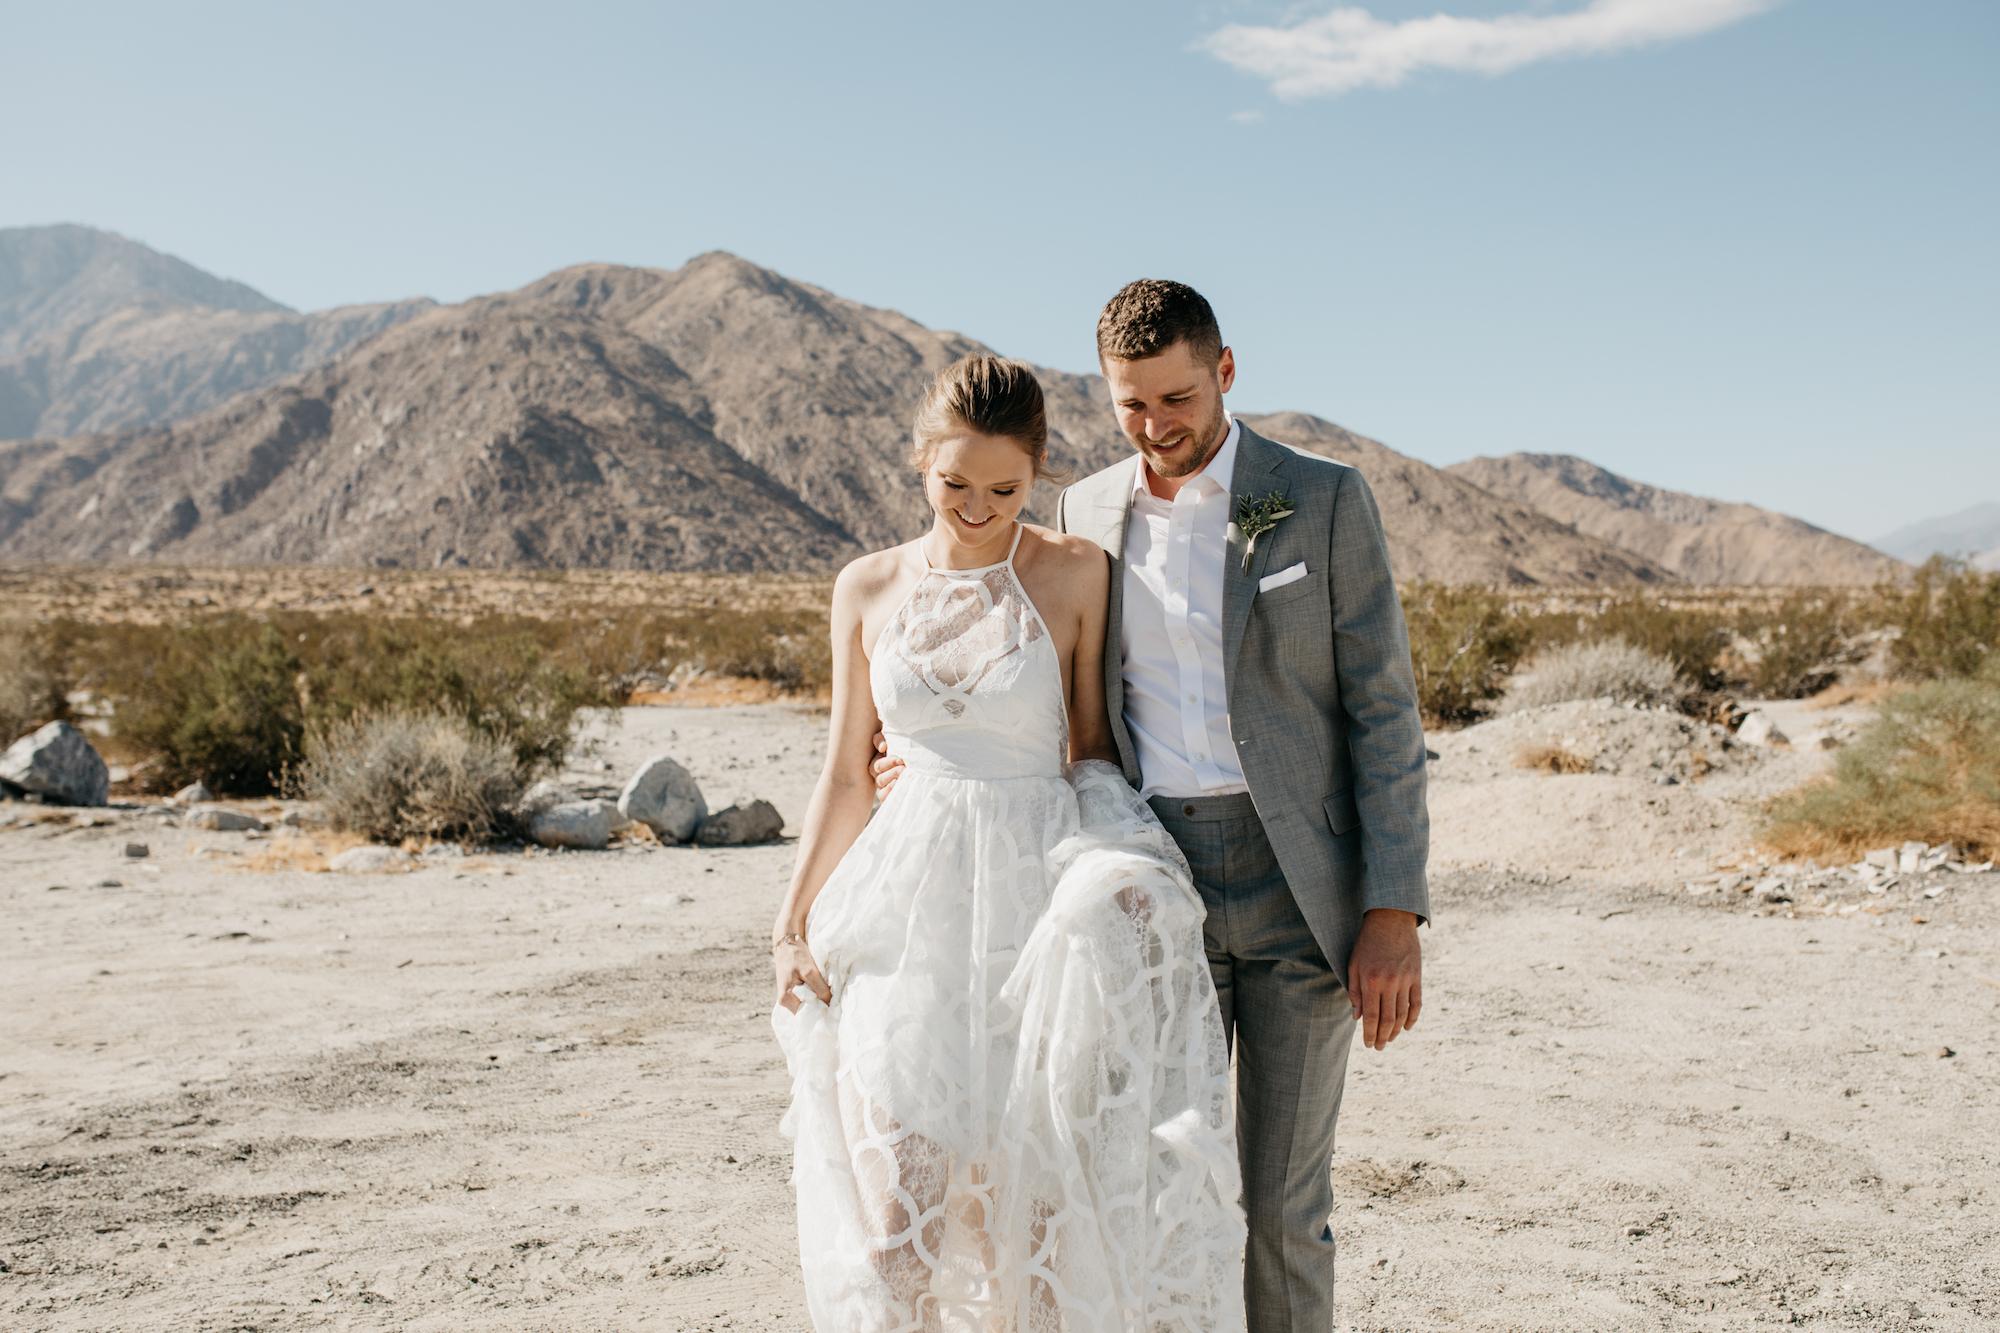 ace-hotel-palm-springs-wedding-photographer241.jpg